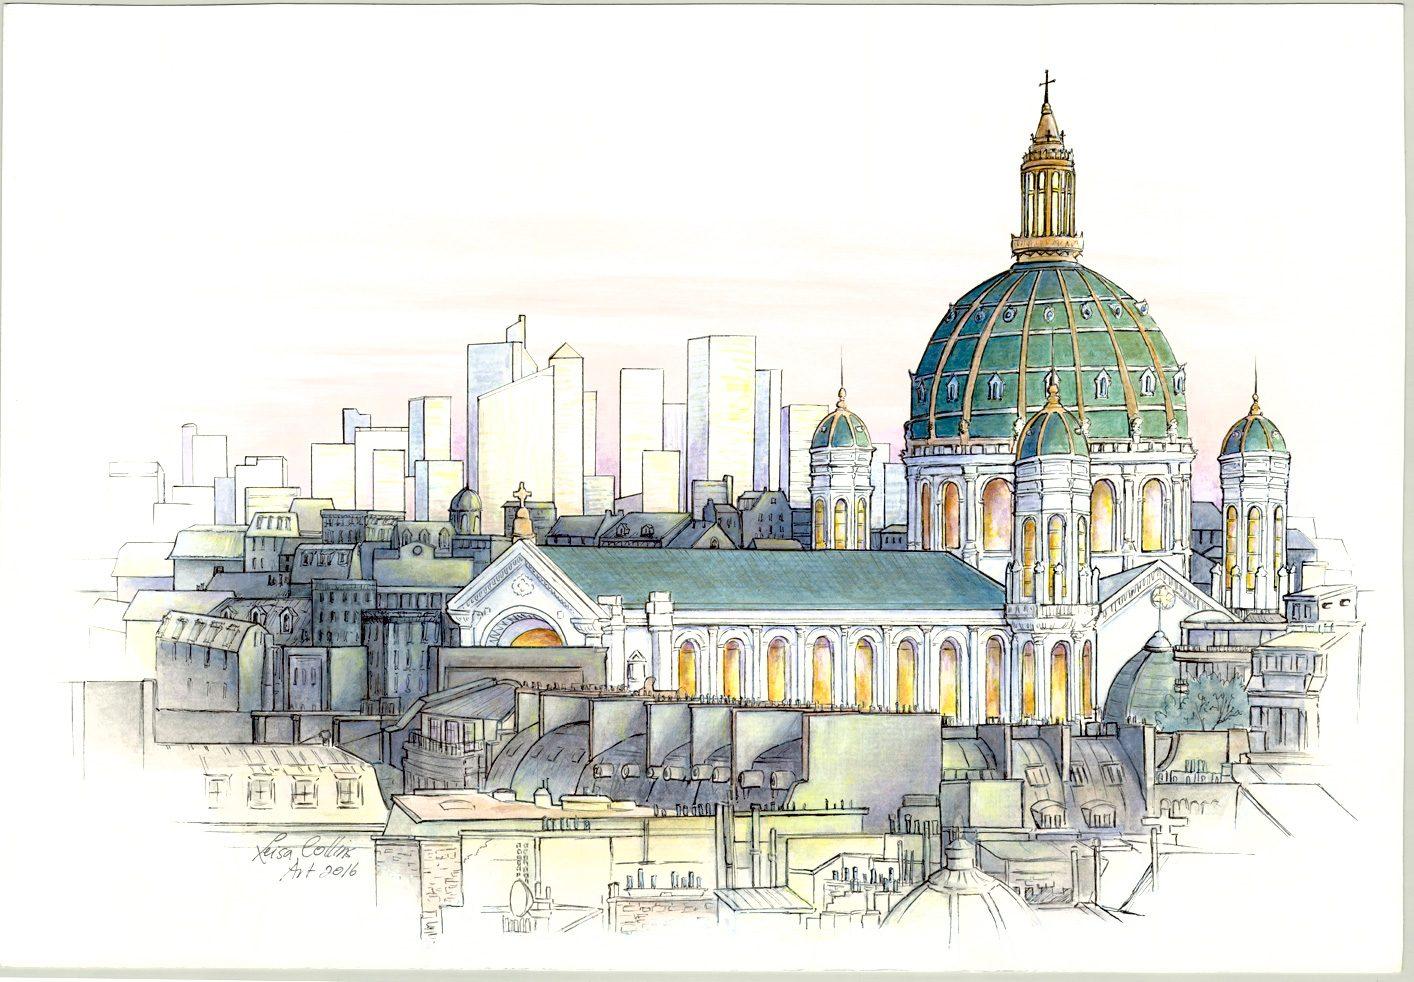 OPTArchitectural-Fusion---Paris-City-Scape-----Pen-&-Watercolor-13-x-19-inches-on-paper